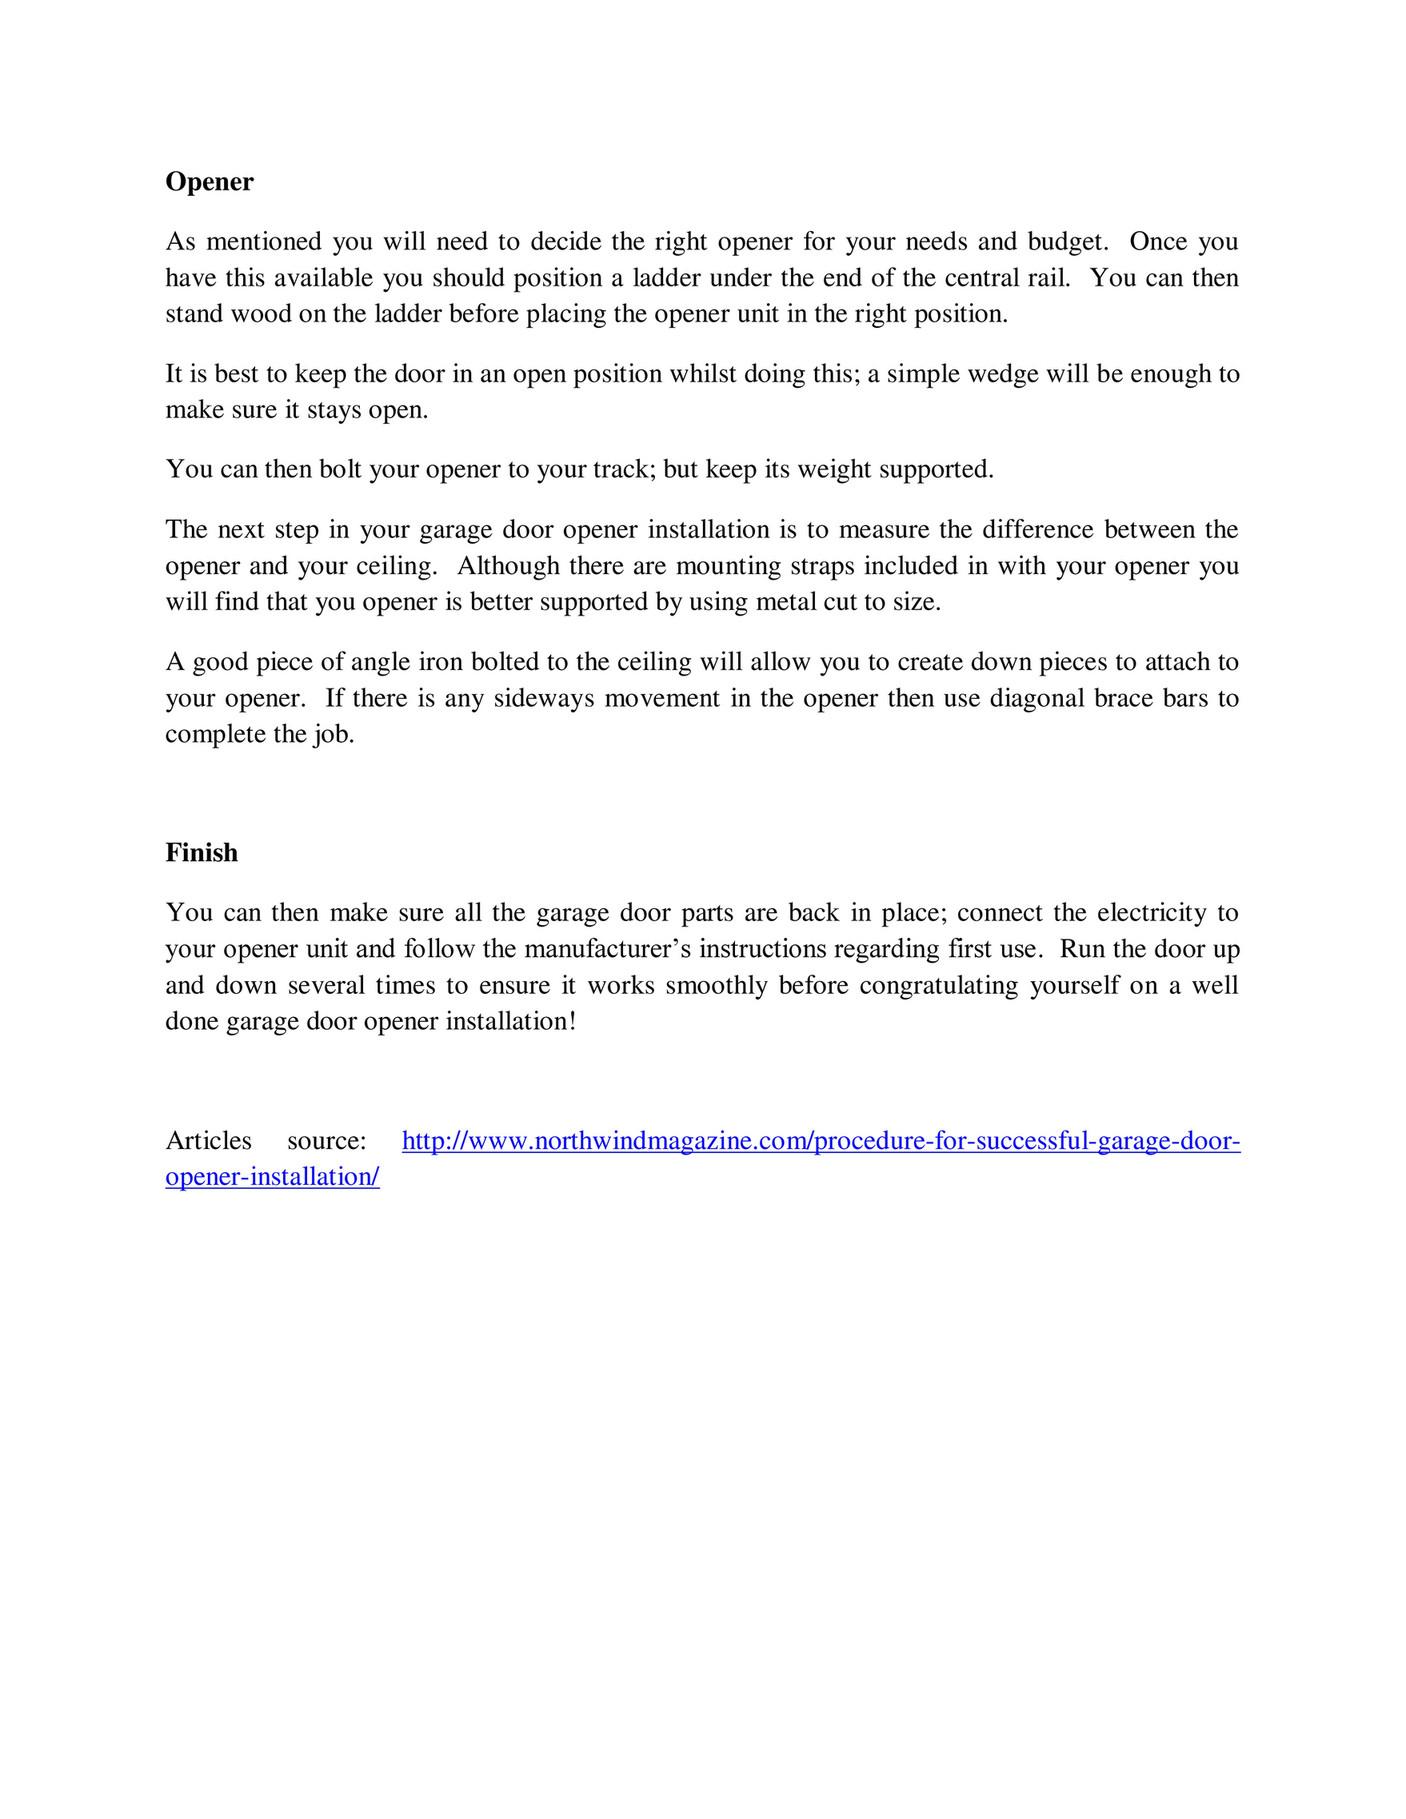 Git Expert Procedure For Successful Garage Door Opener Installation Page 2 Created With Publitas Com